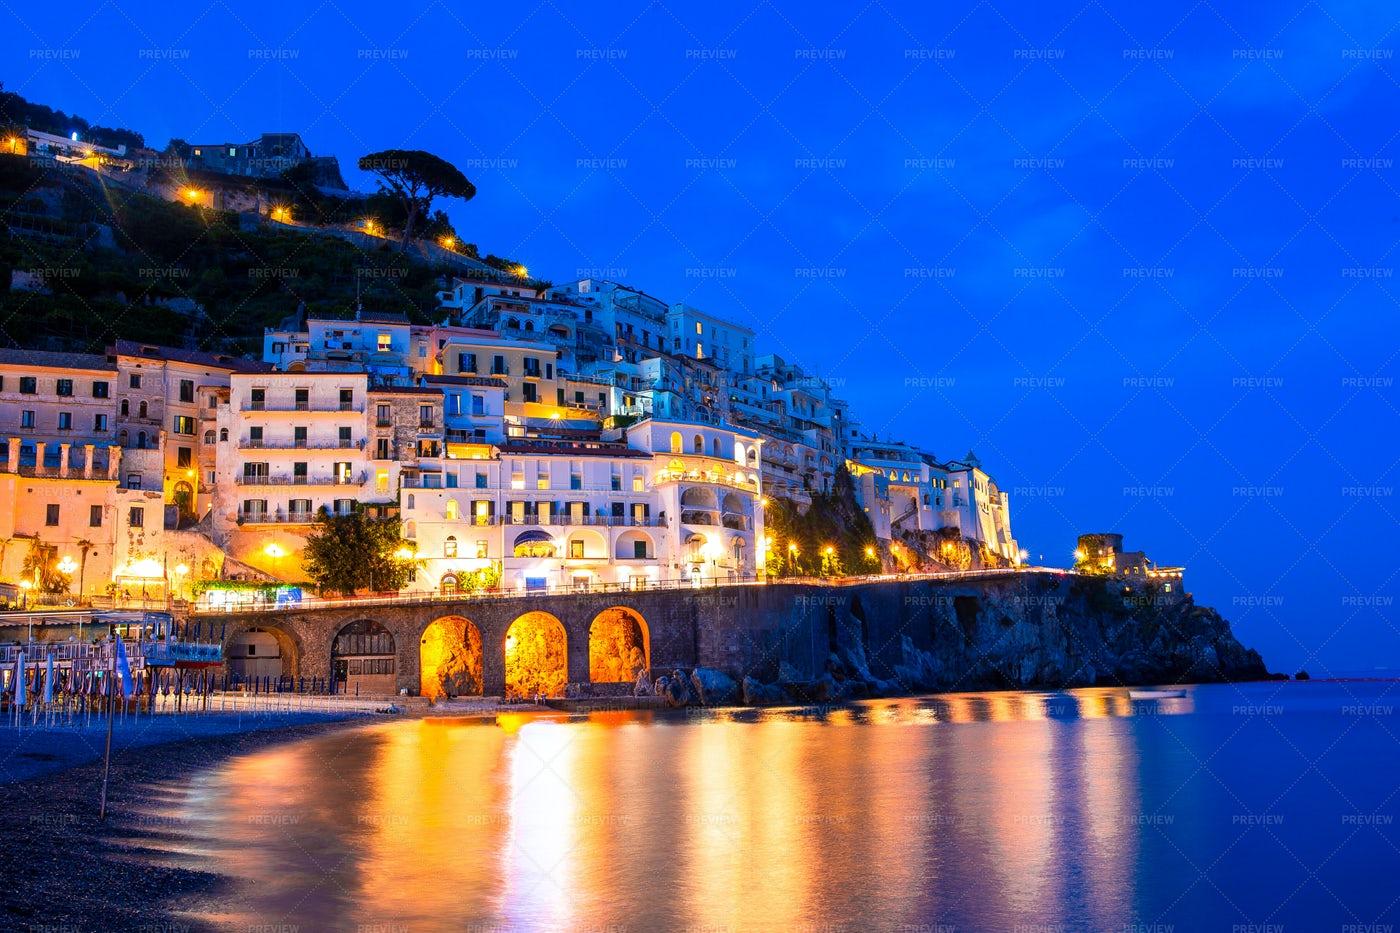 Illuminated Coastal Town In Itlay: Stock Photos